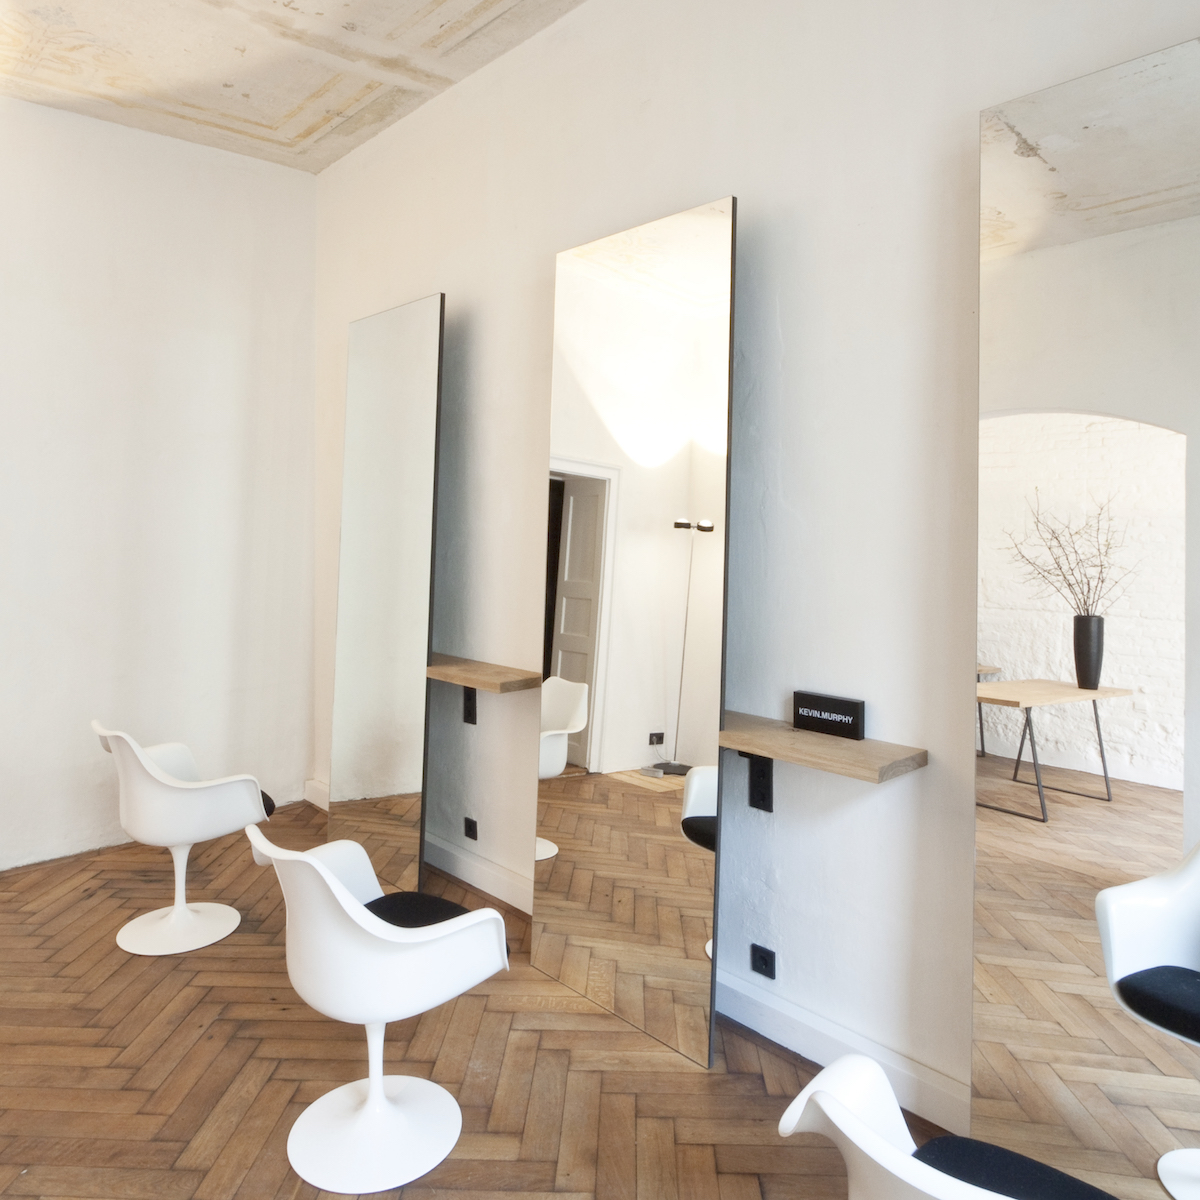 Dressler Friseur Salon in Schwabing - München | CREME GUIDES